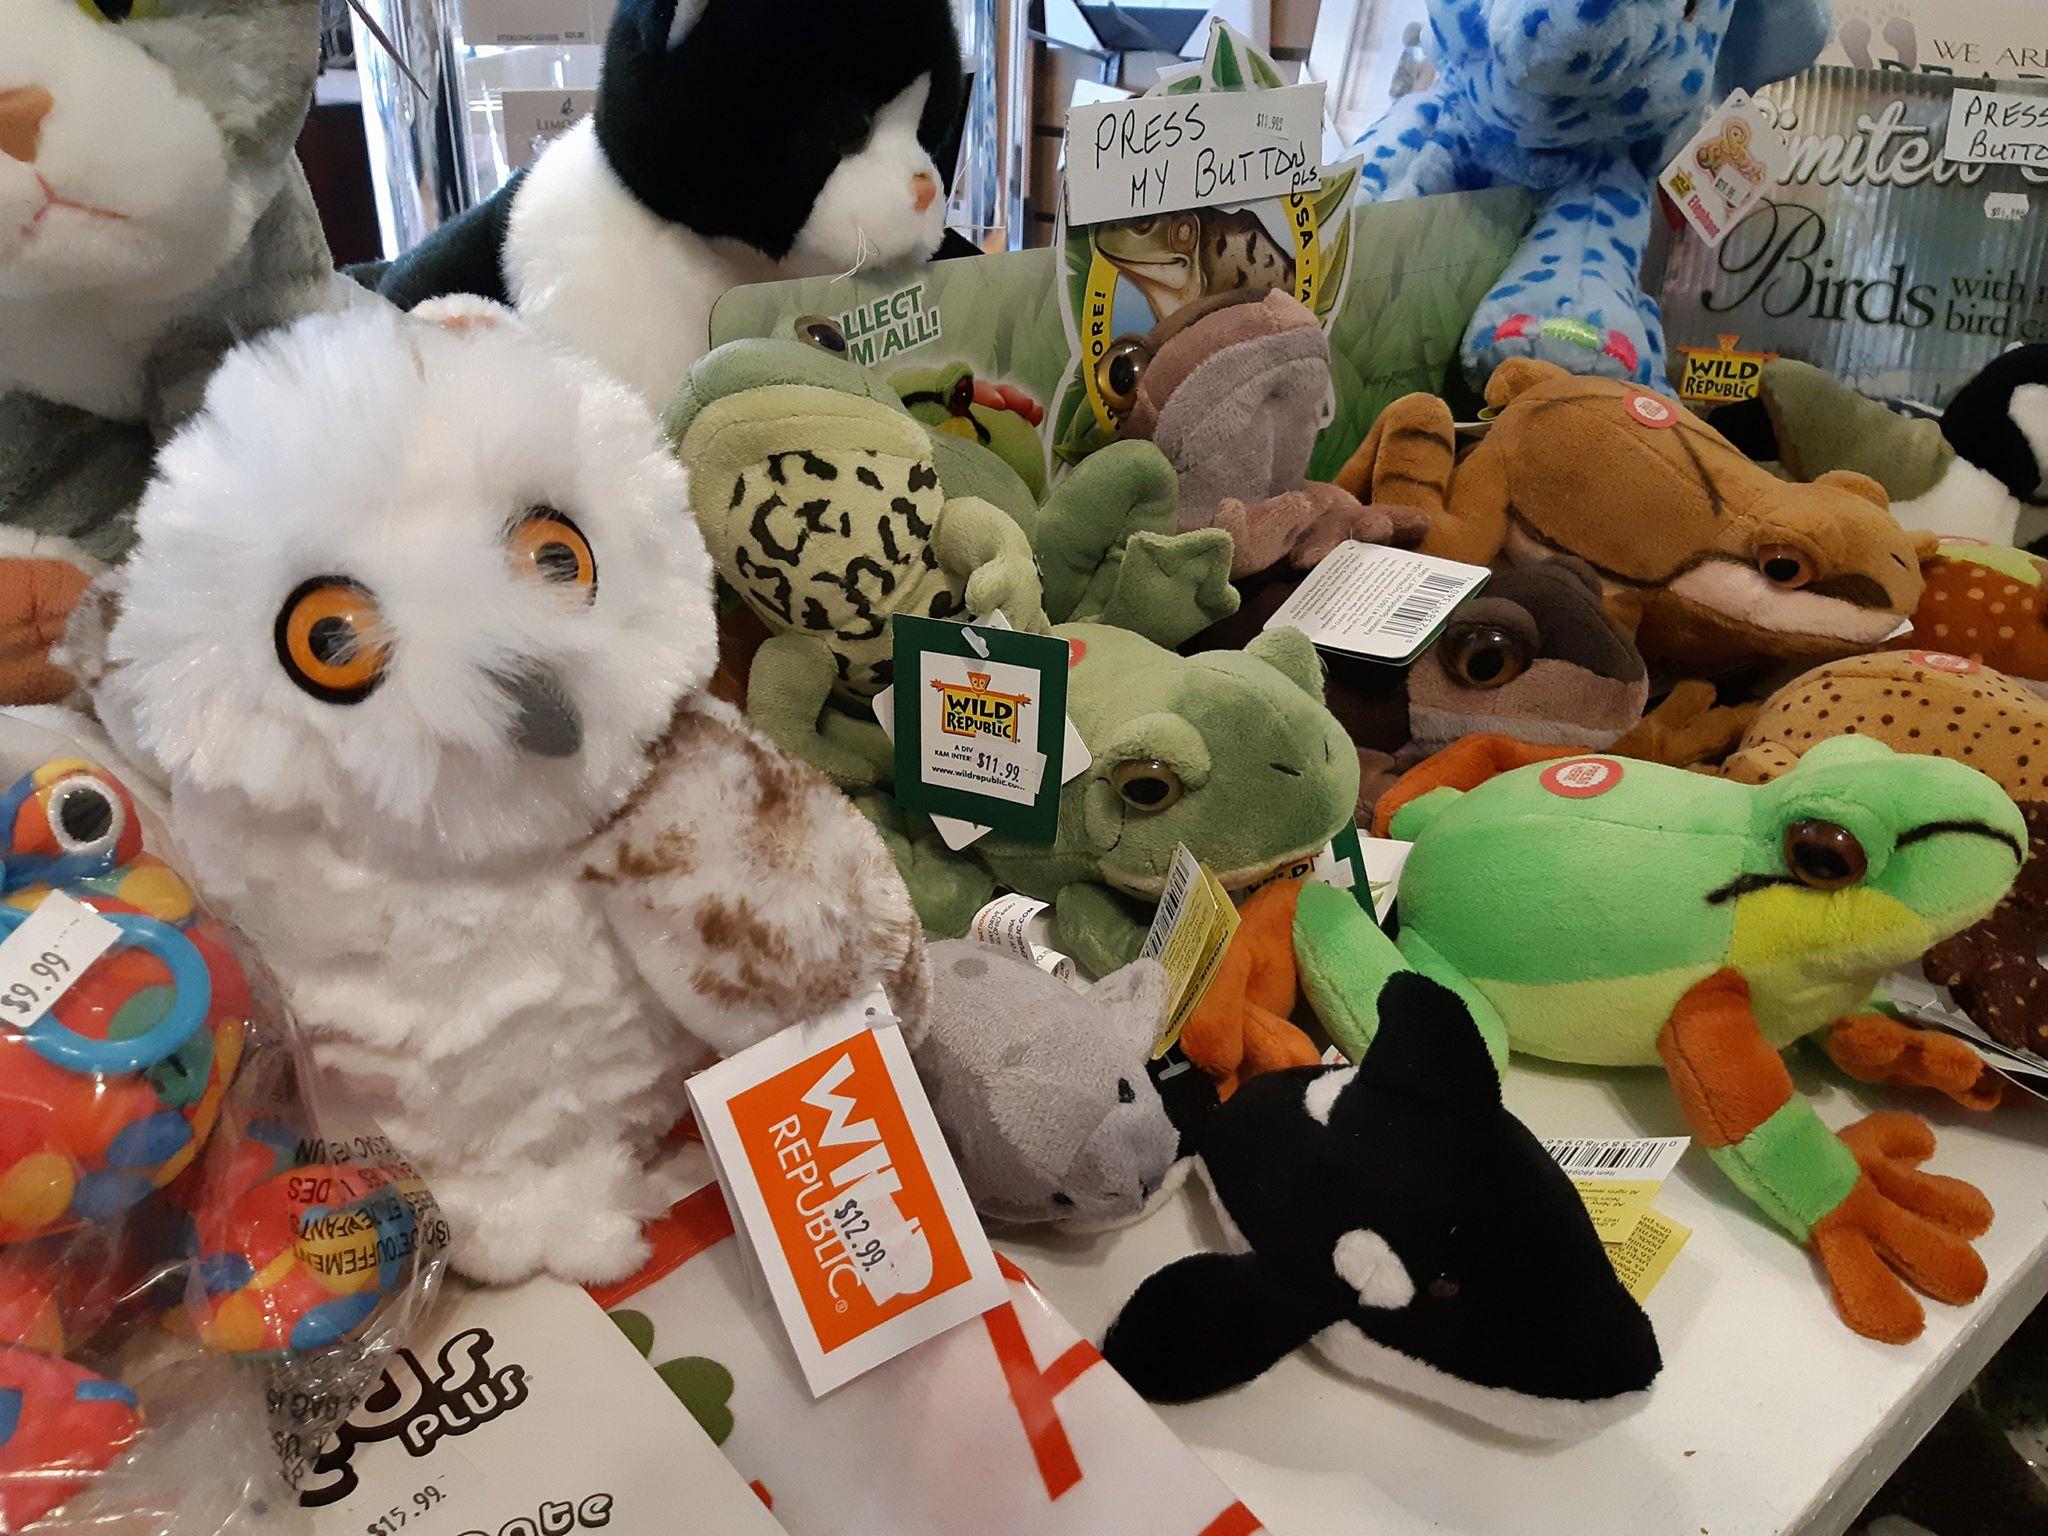 toys, stuffed animals